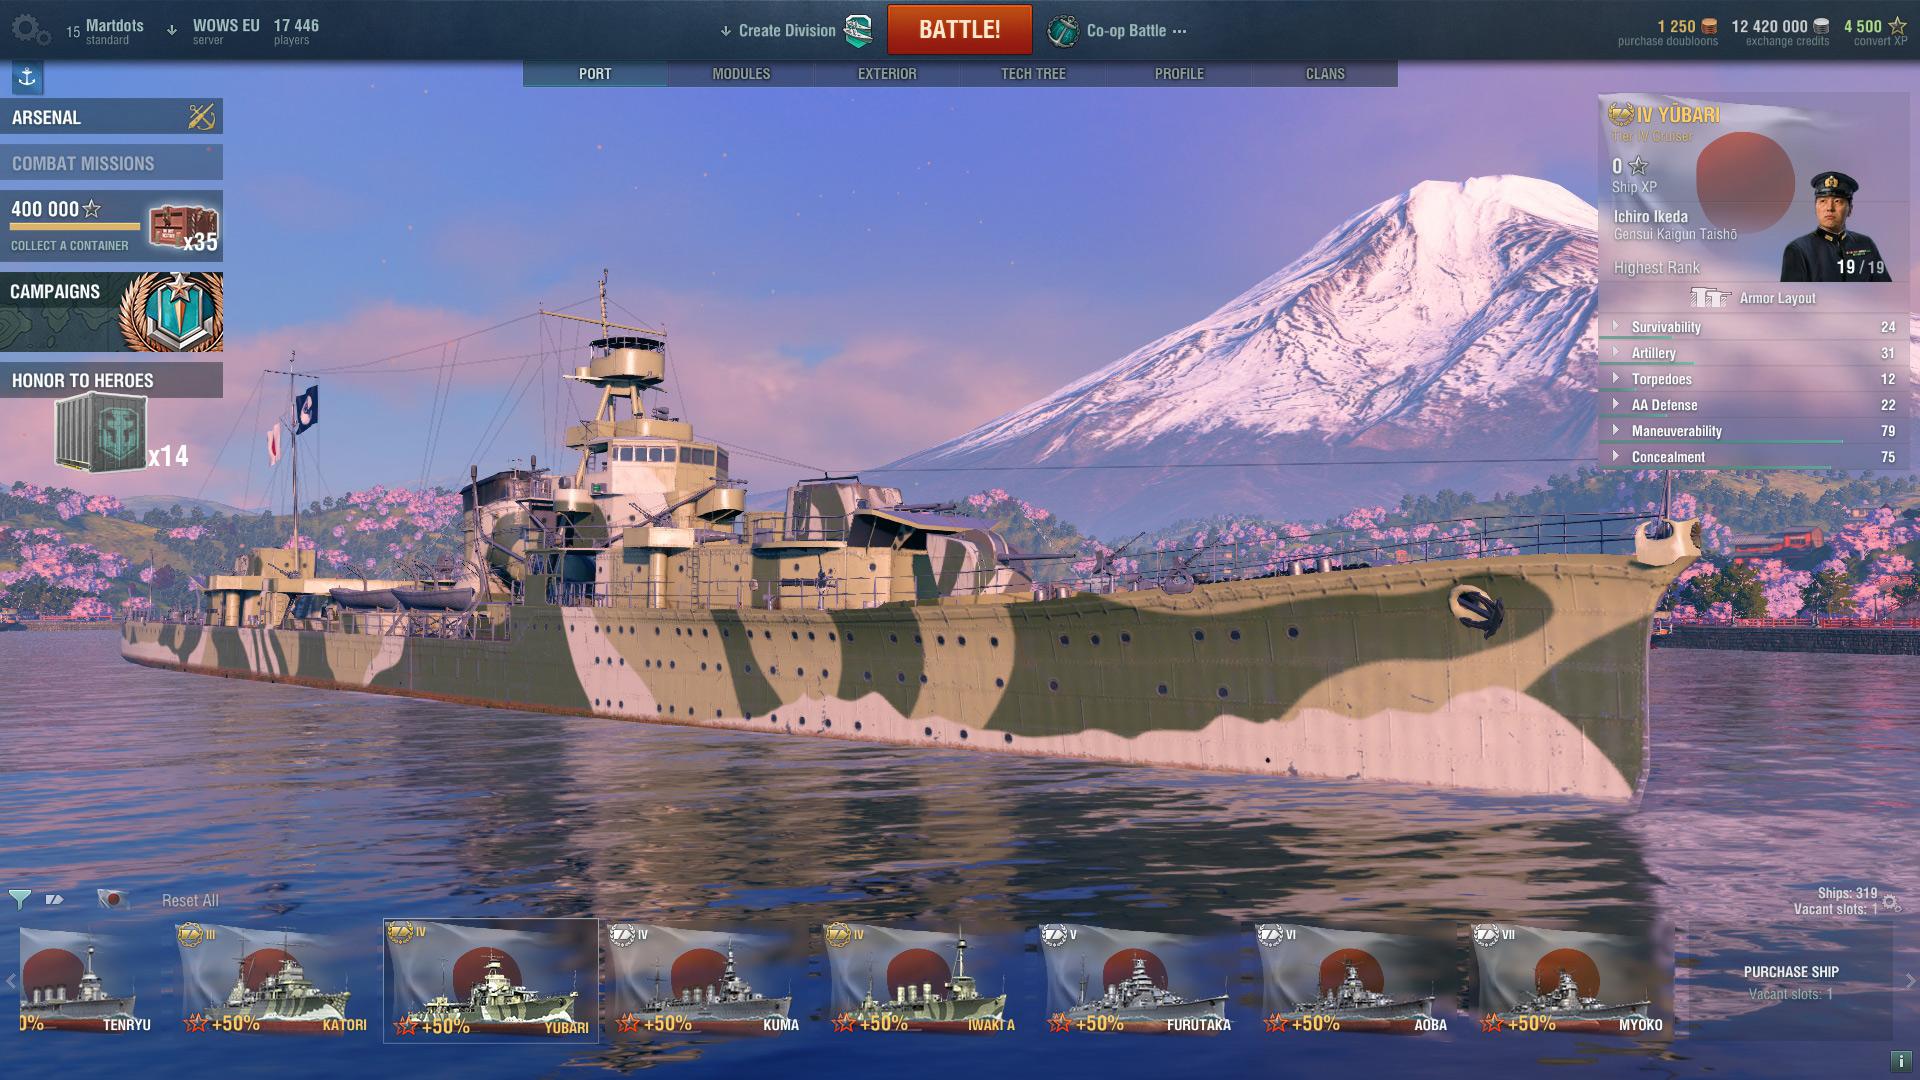 World of Warships: Yubari Steam Edition 2018 pc game Img-2